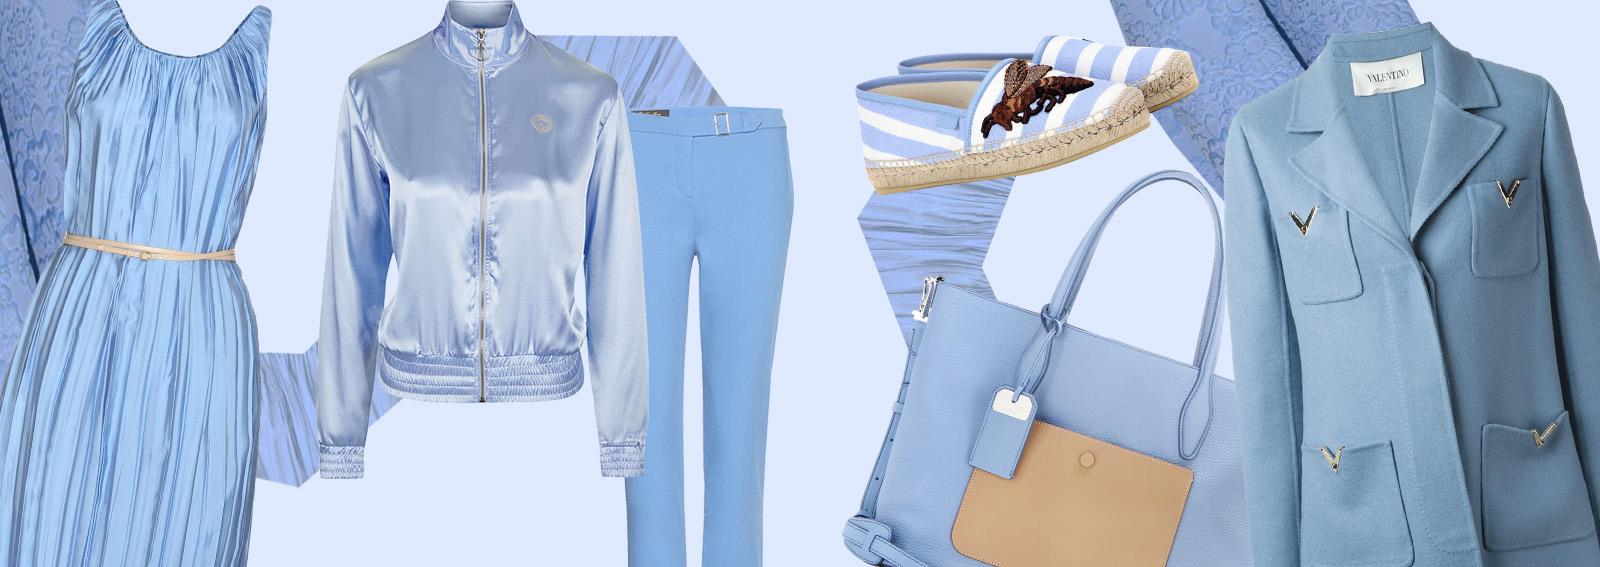 cover serenity l'azzurro pantone per la primavera dekstop